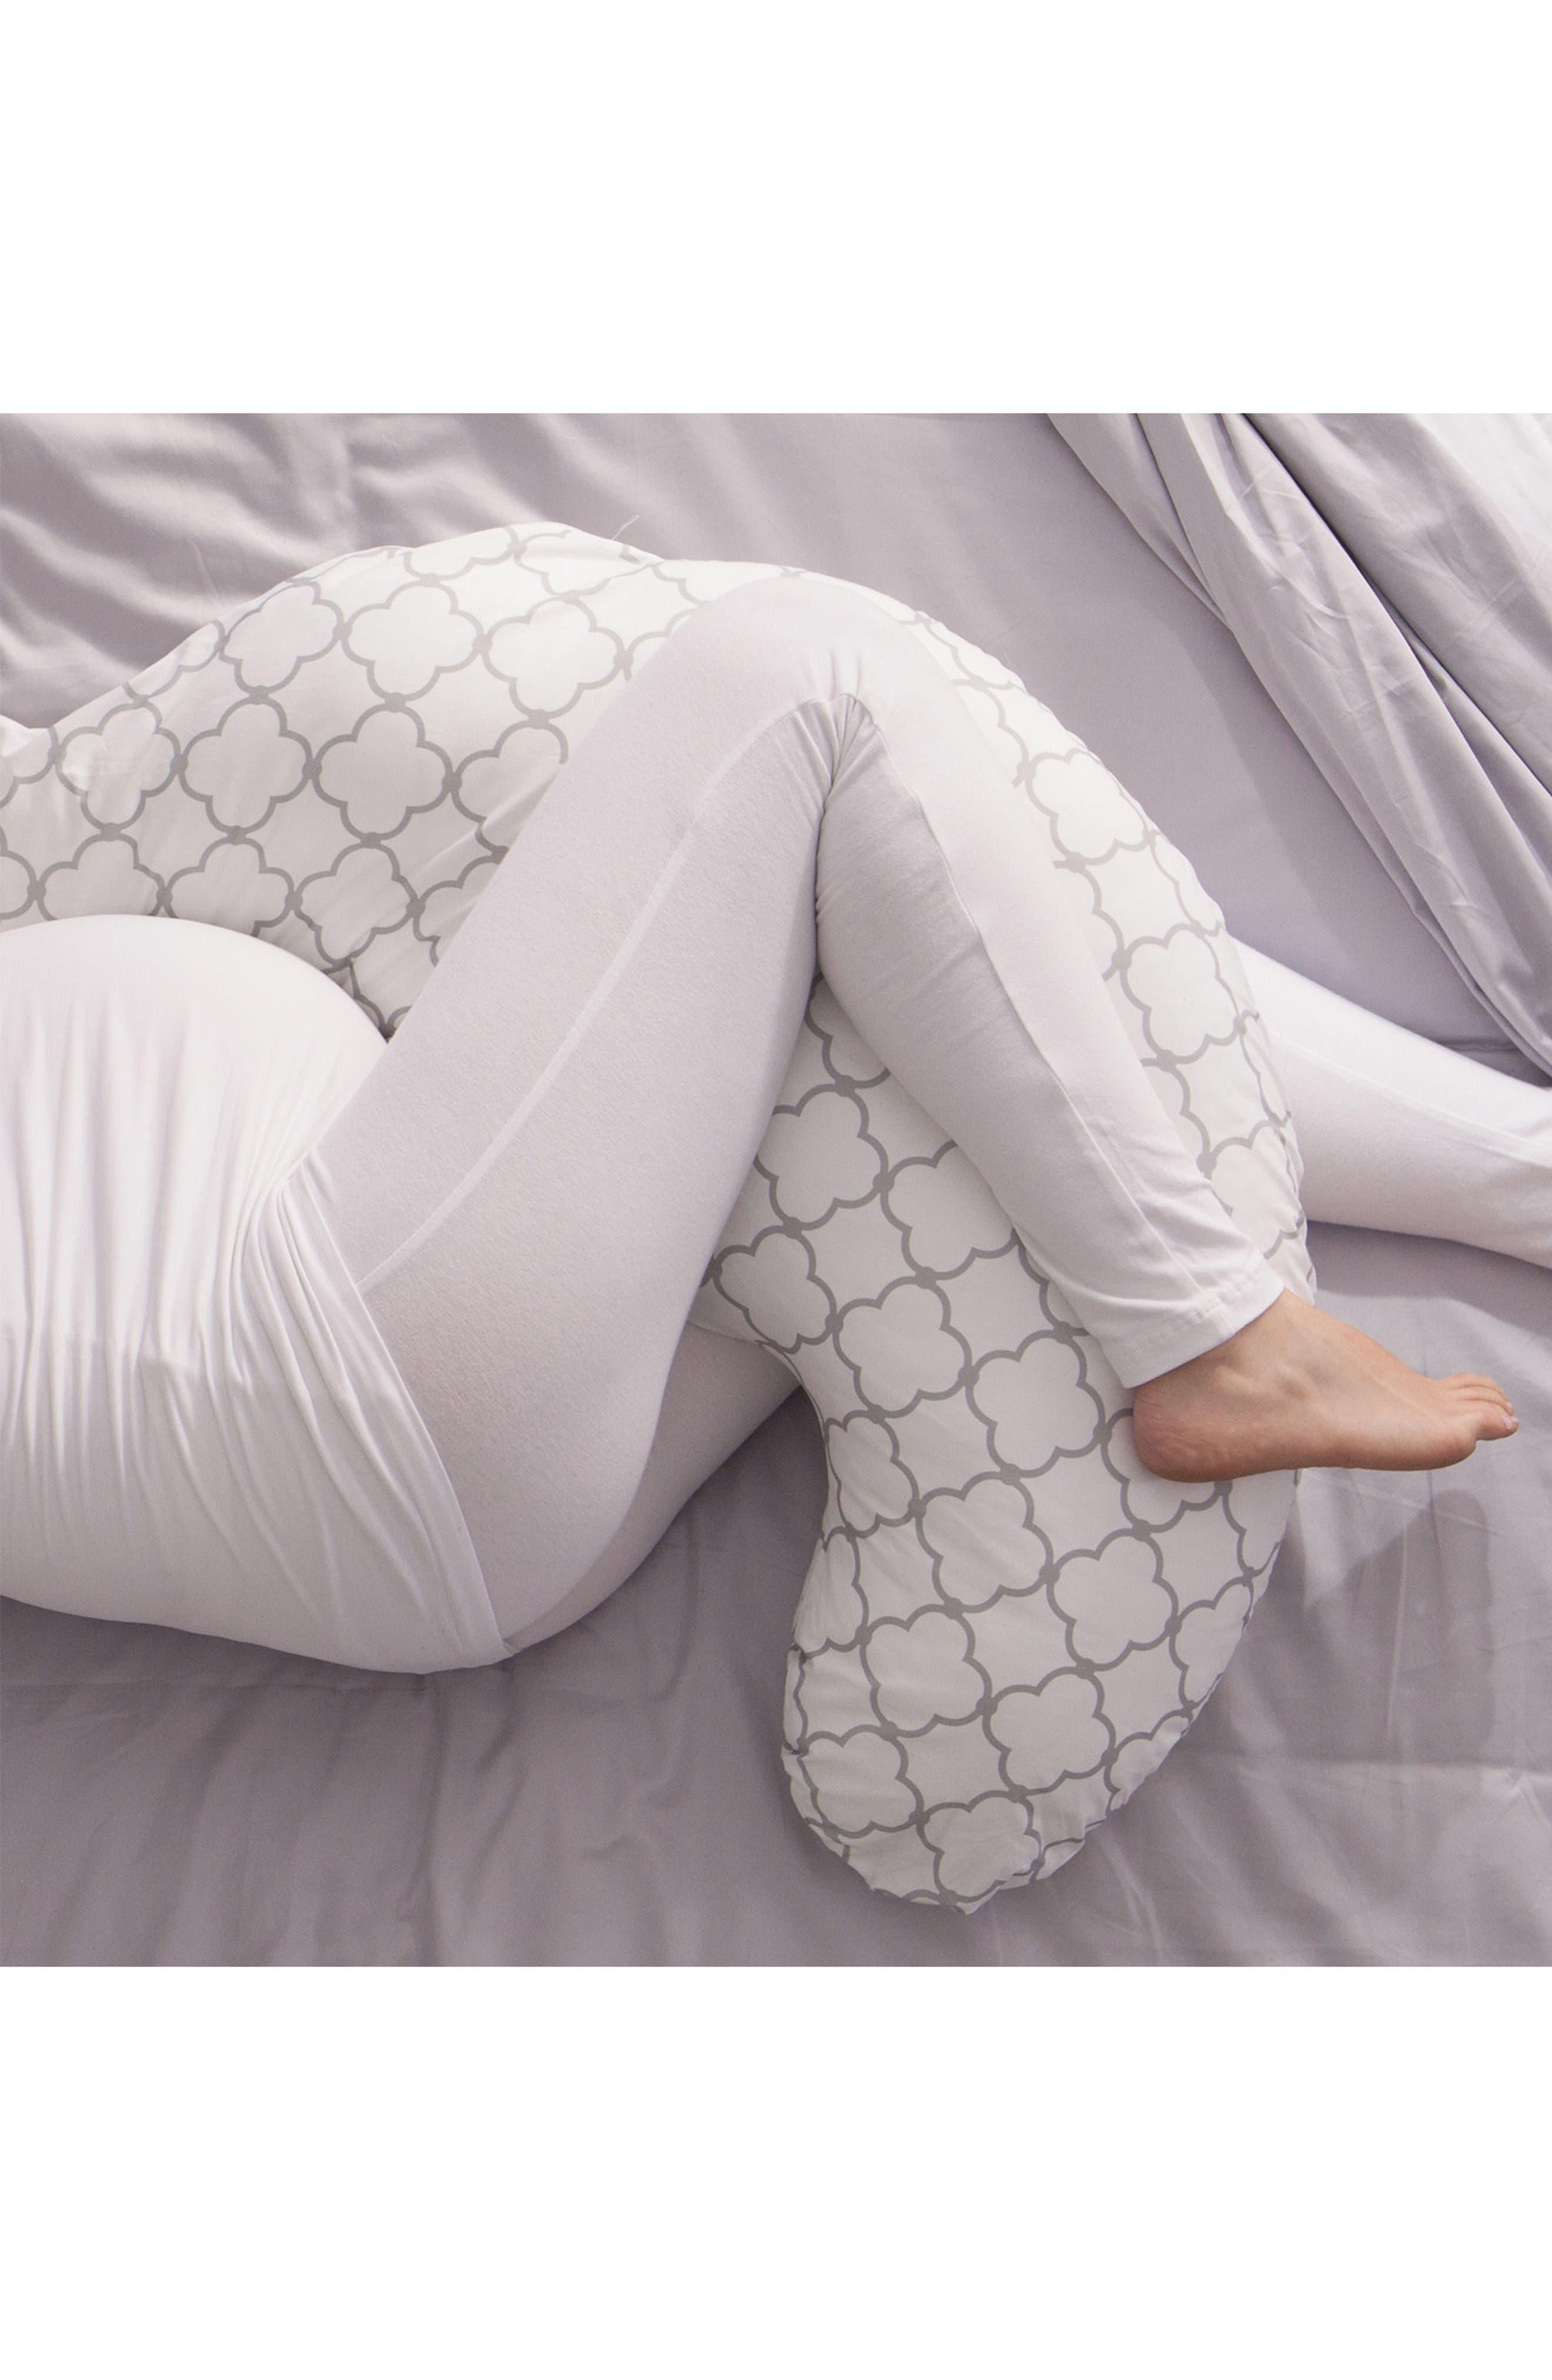 Total Pregnancy Support Pillow,                             Alternate thumbnail 3, color,                             White Trellis